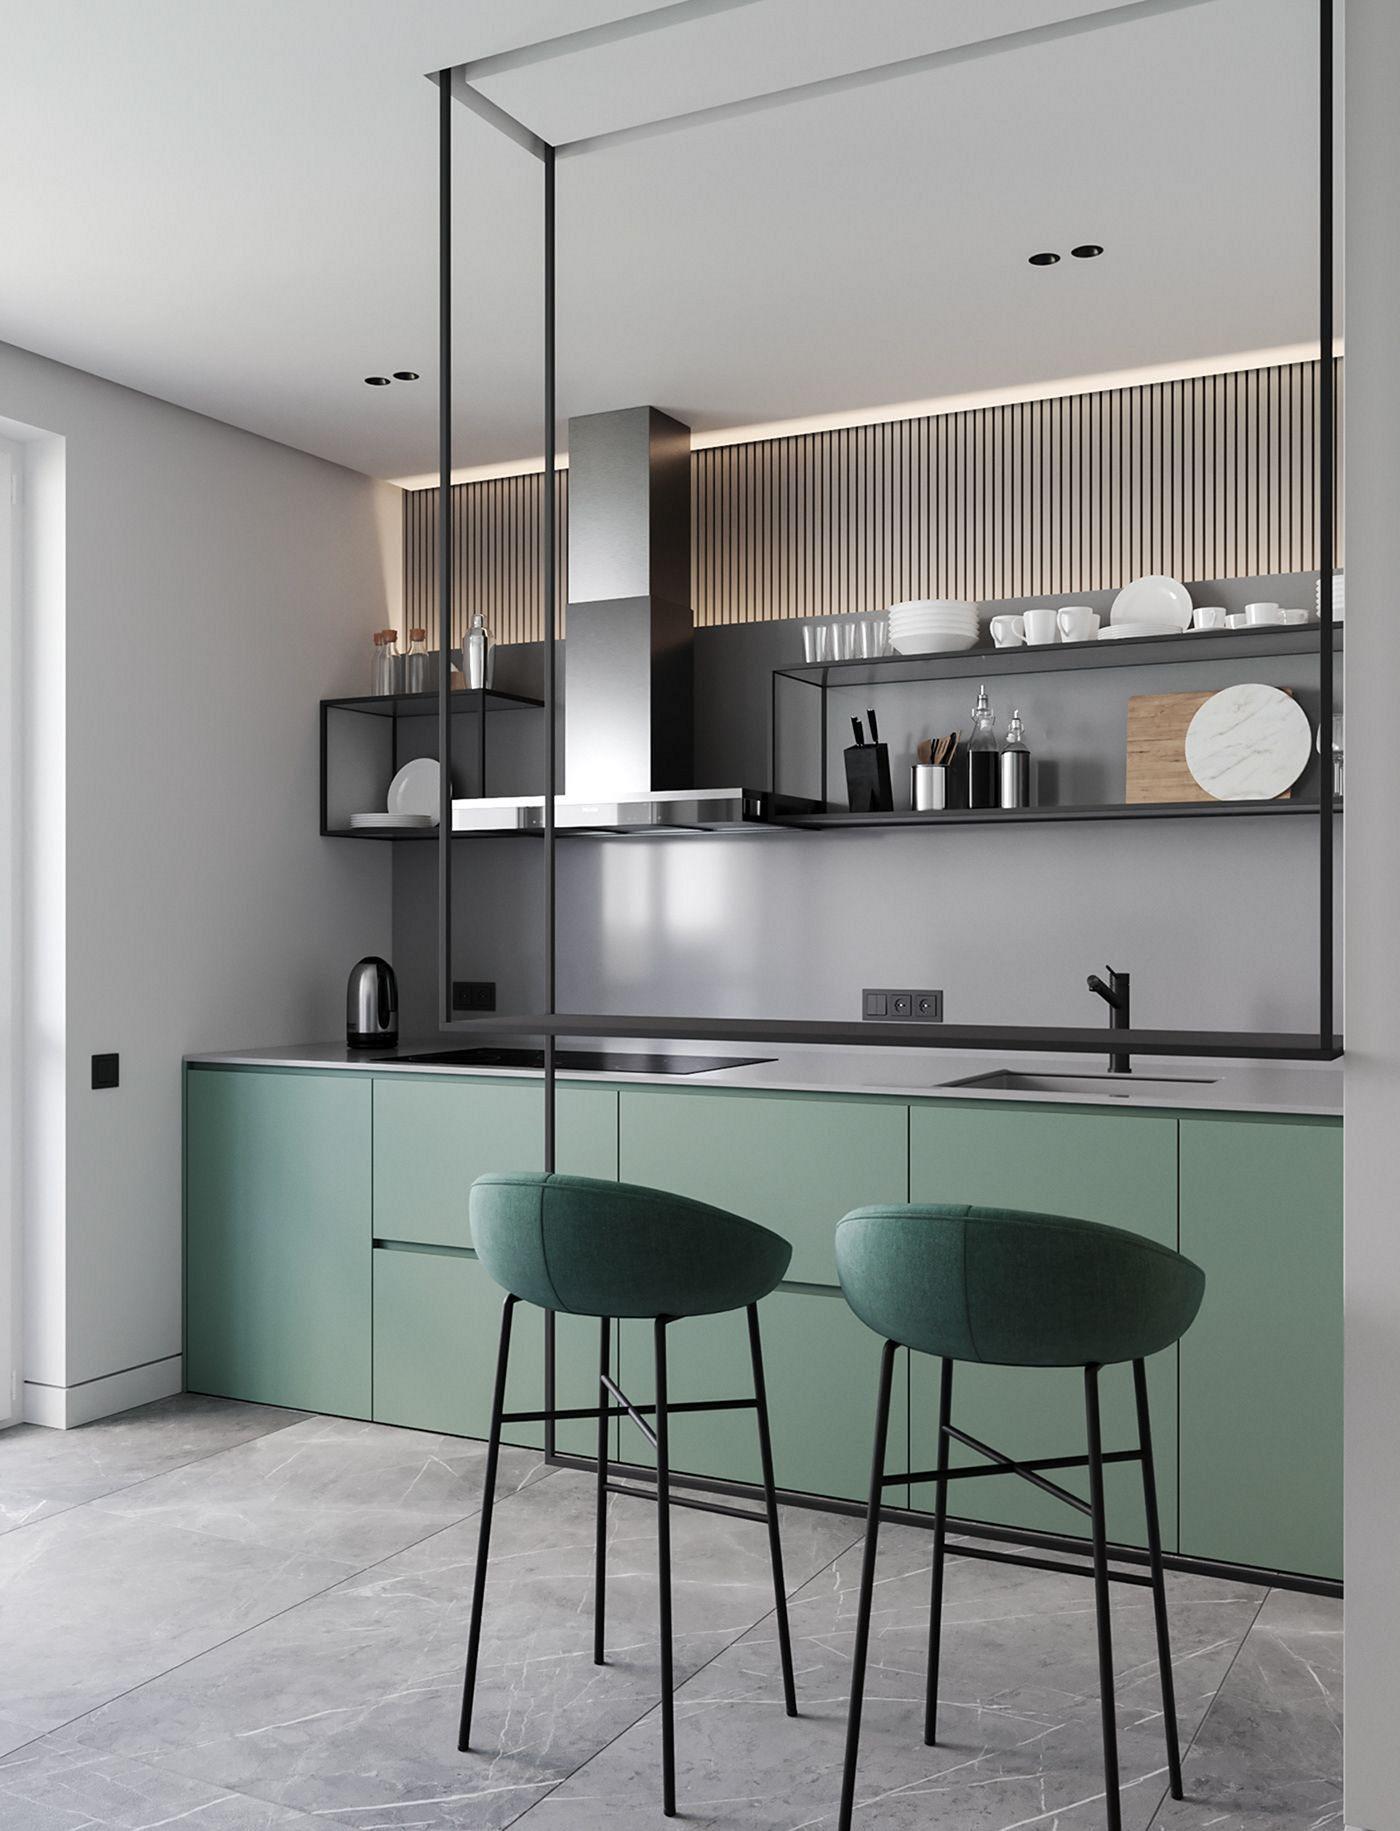 Awesome Minimalist Kitchen Ideas